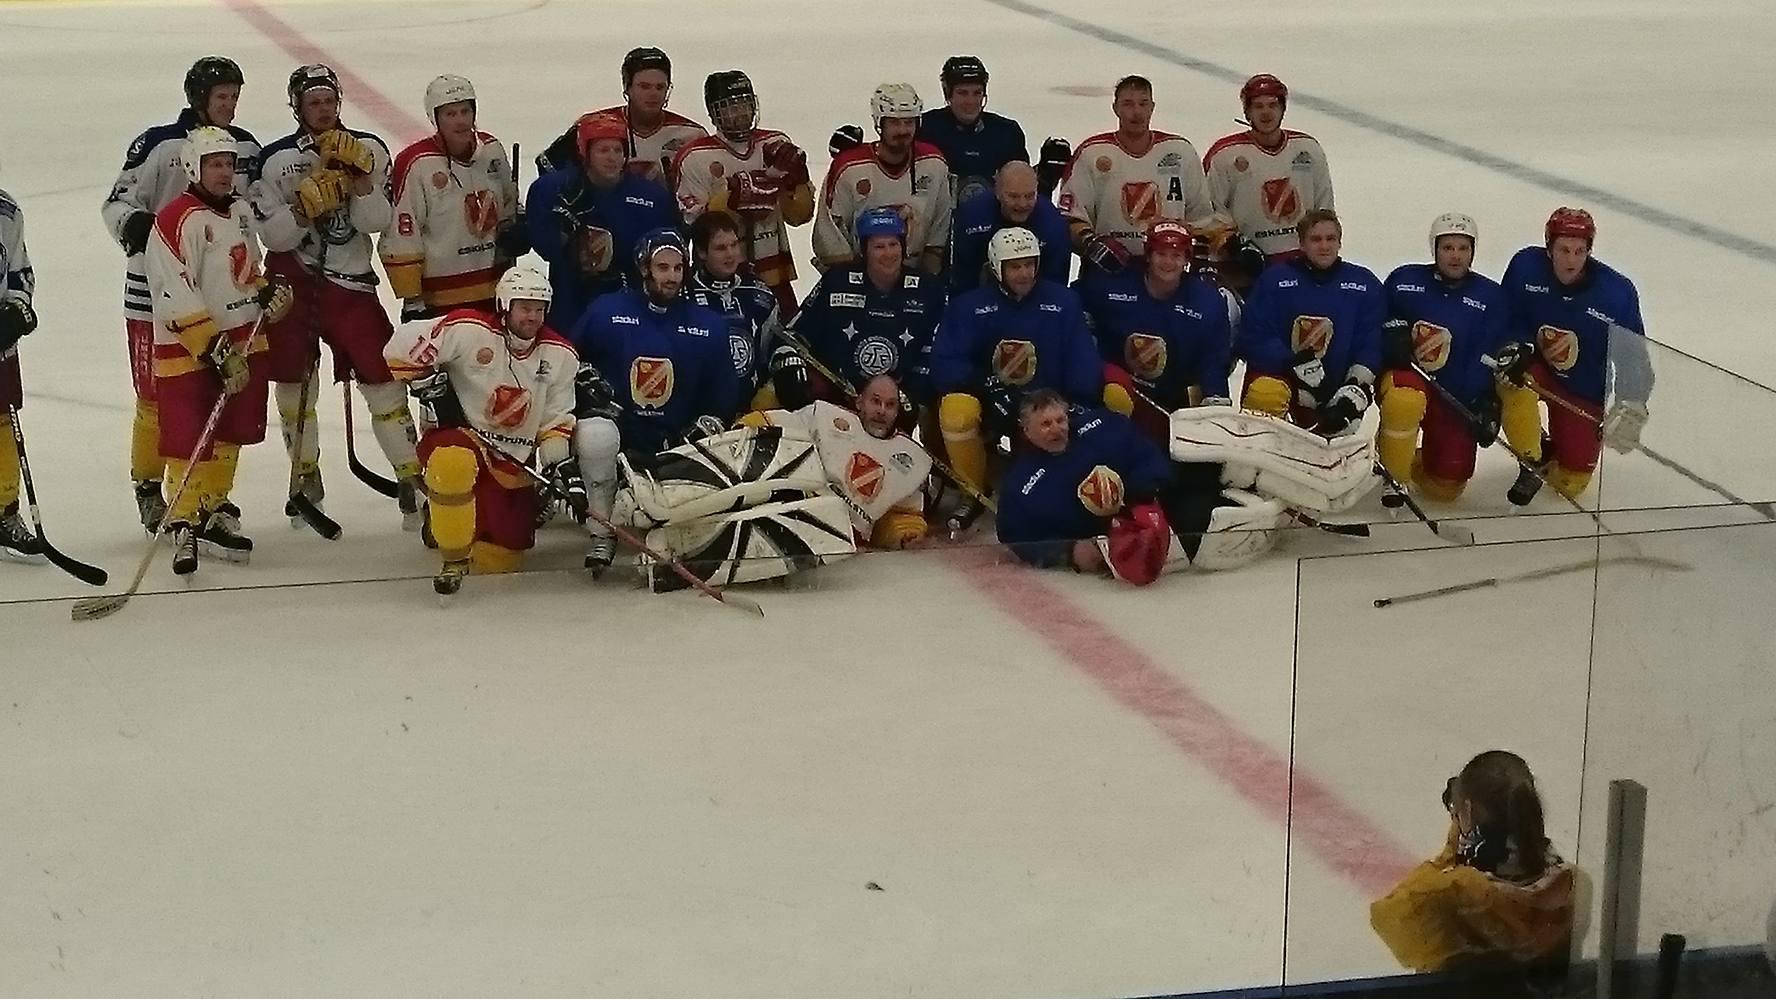 Mälarmashockey